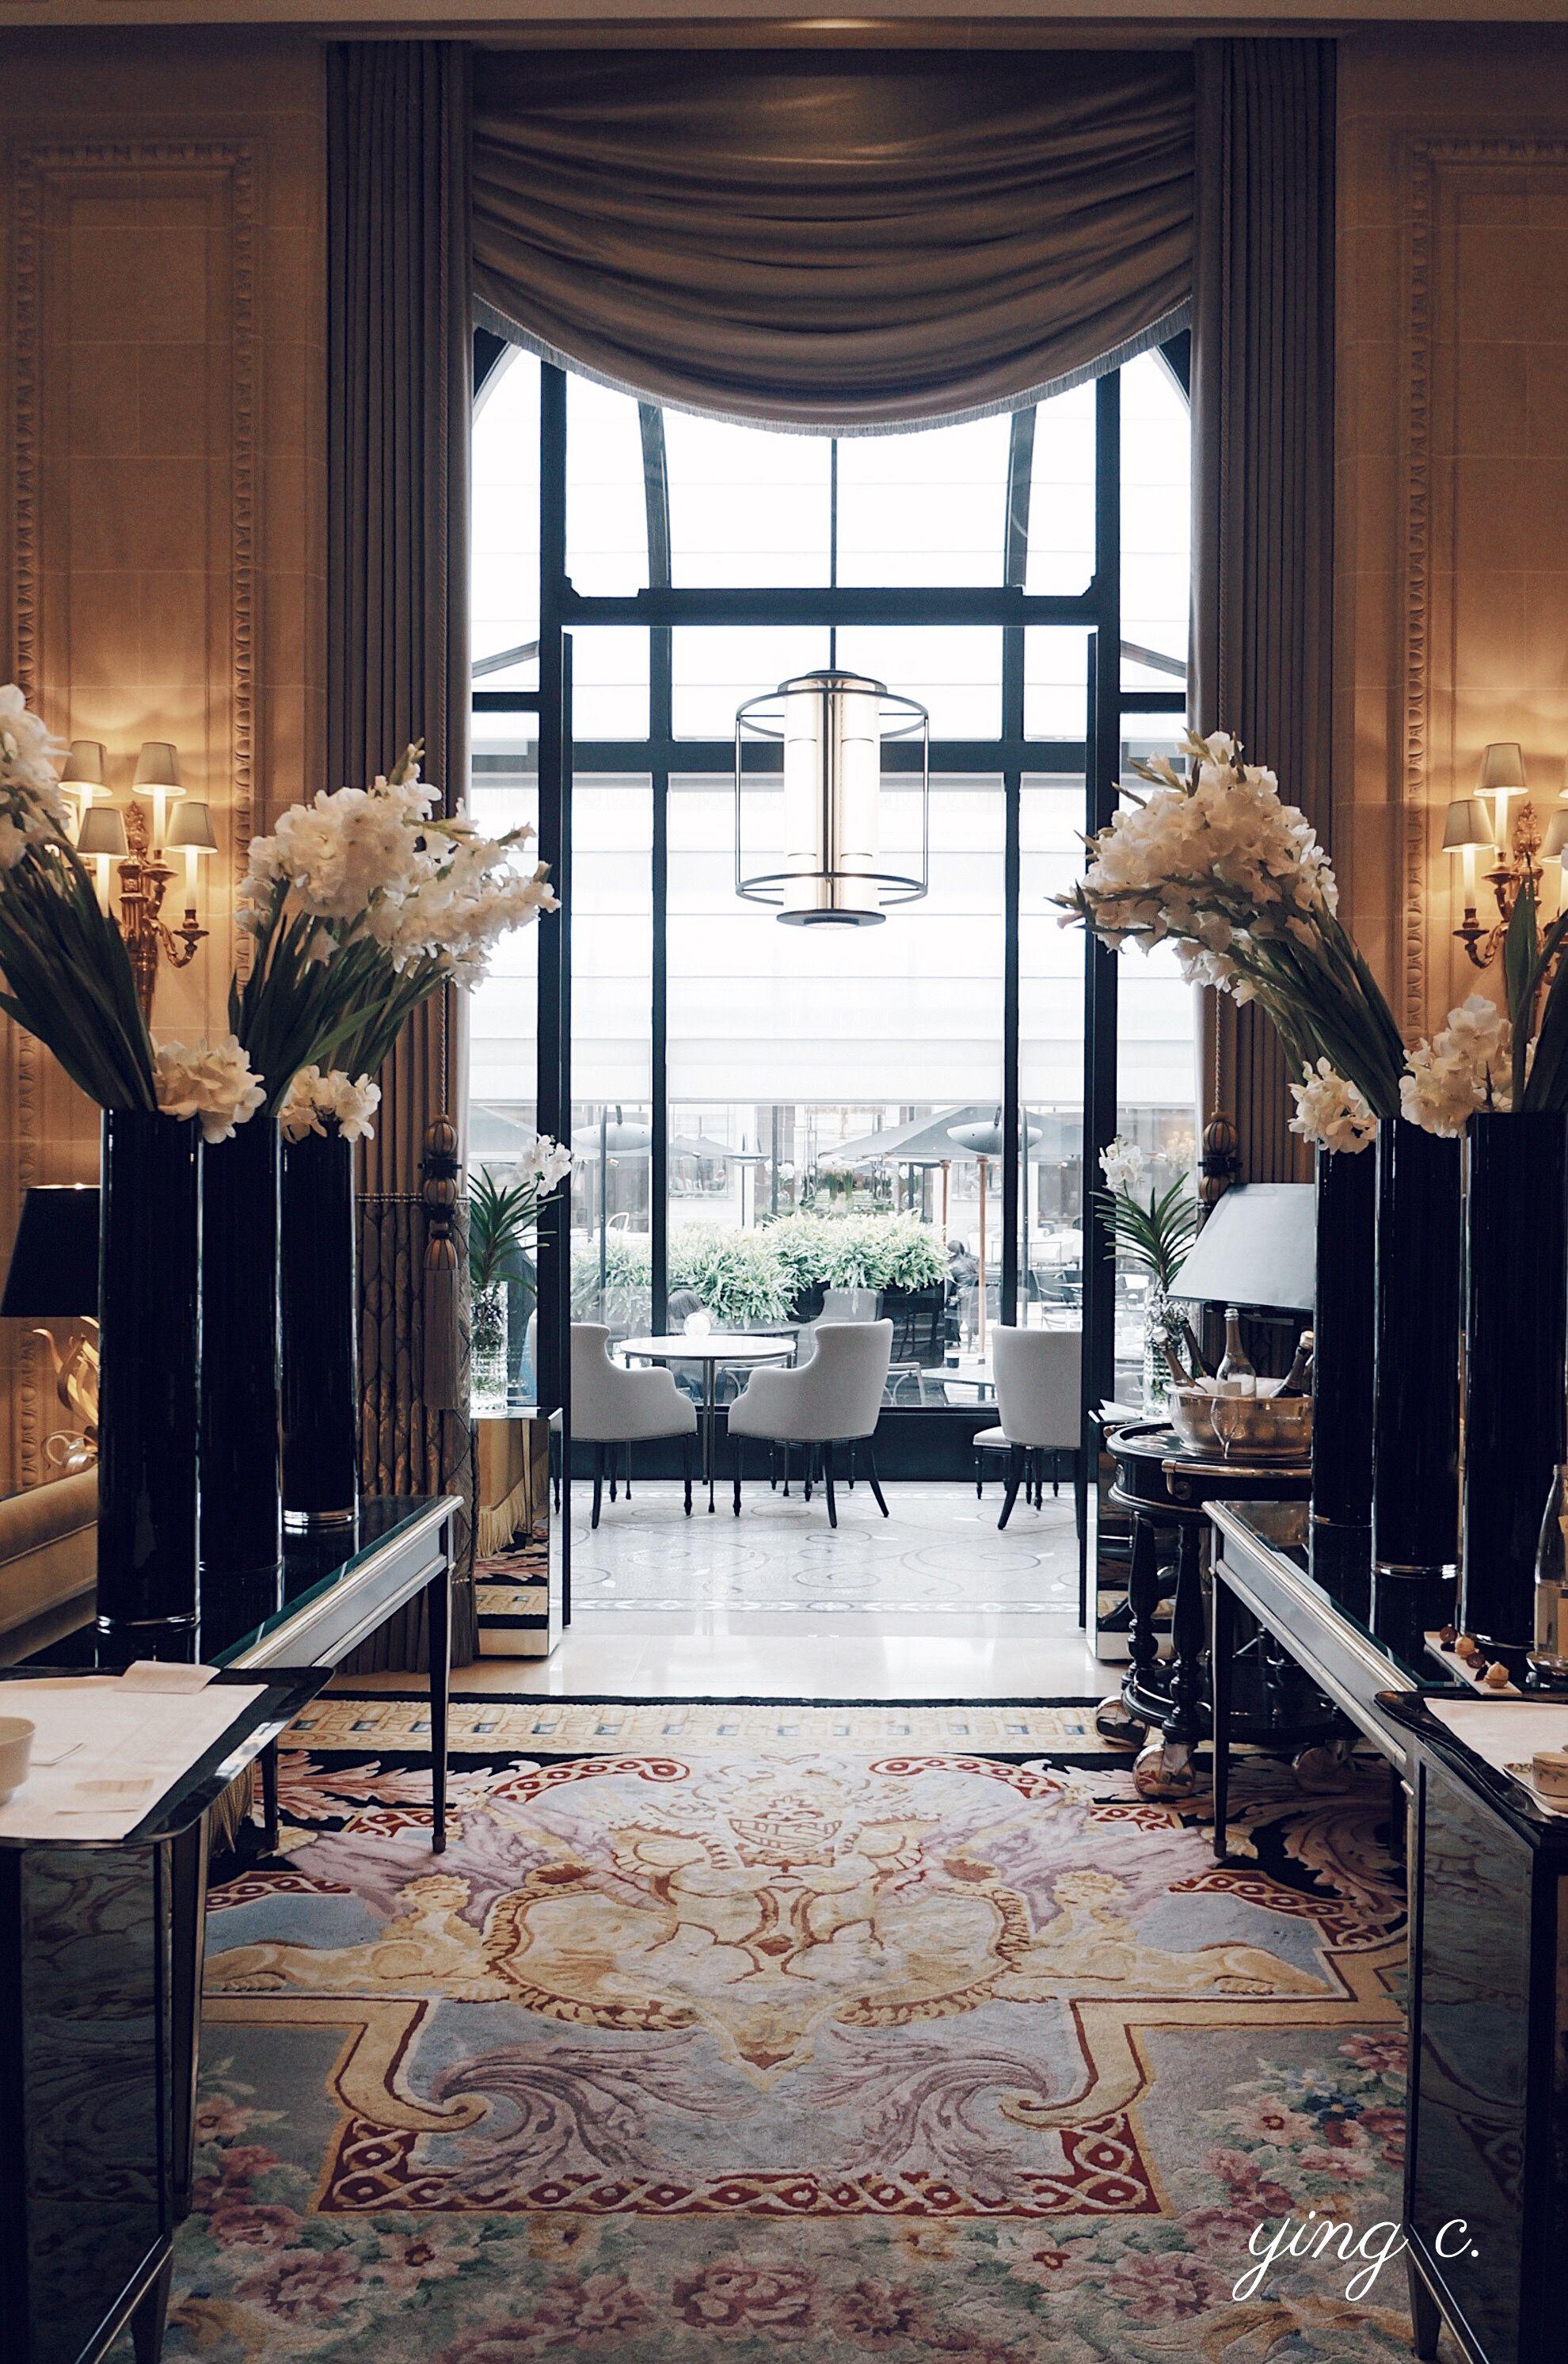 George V 飯店內 l'Orangerie 餐廳的入口。